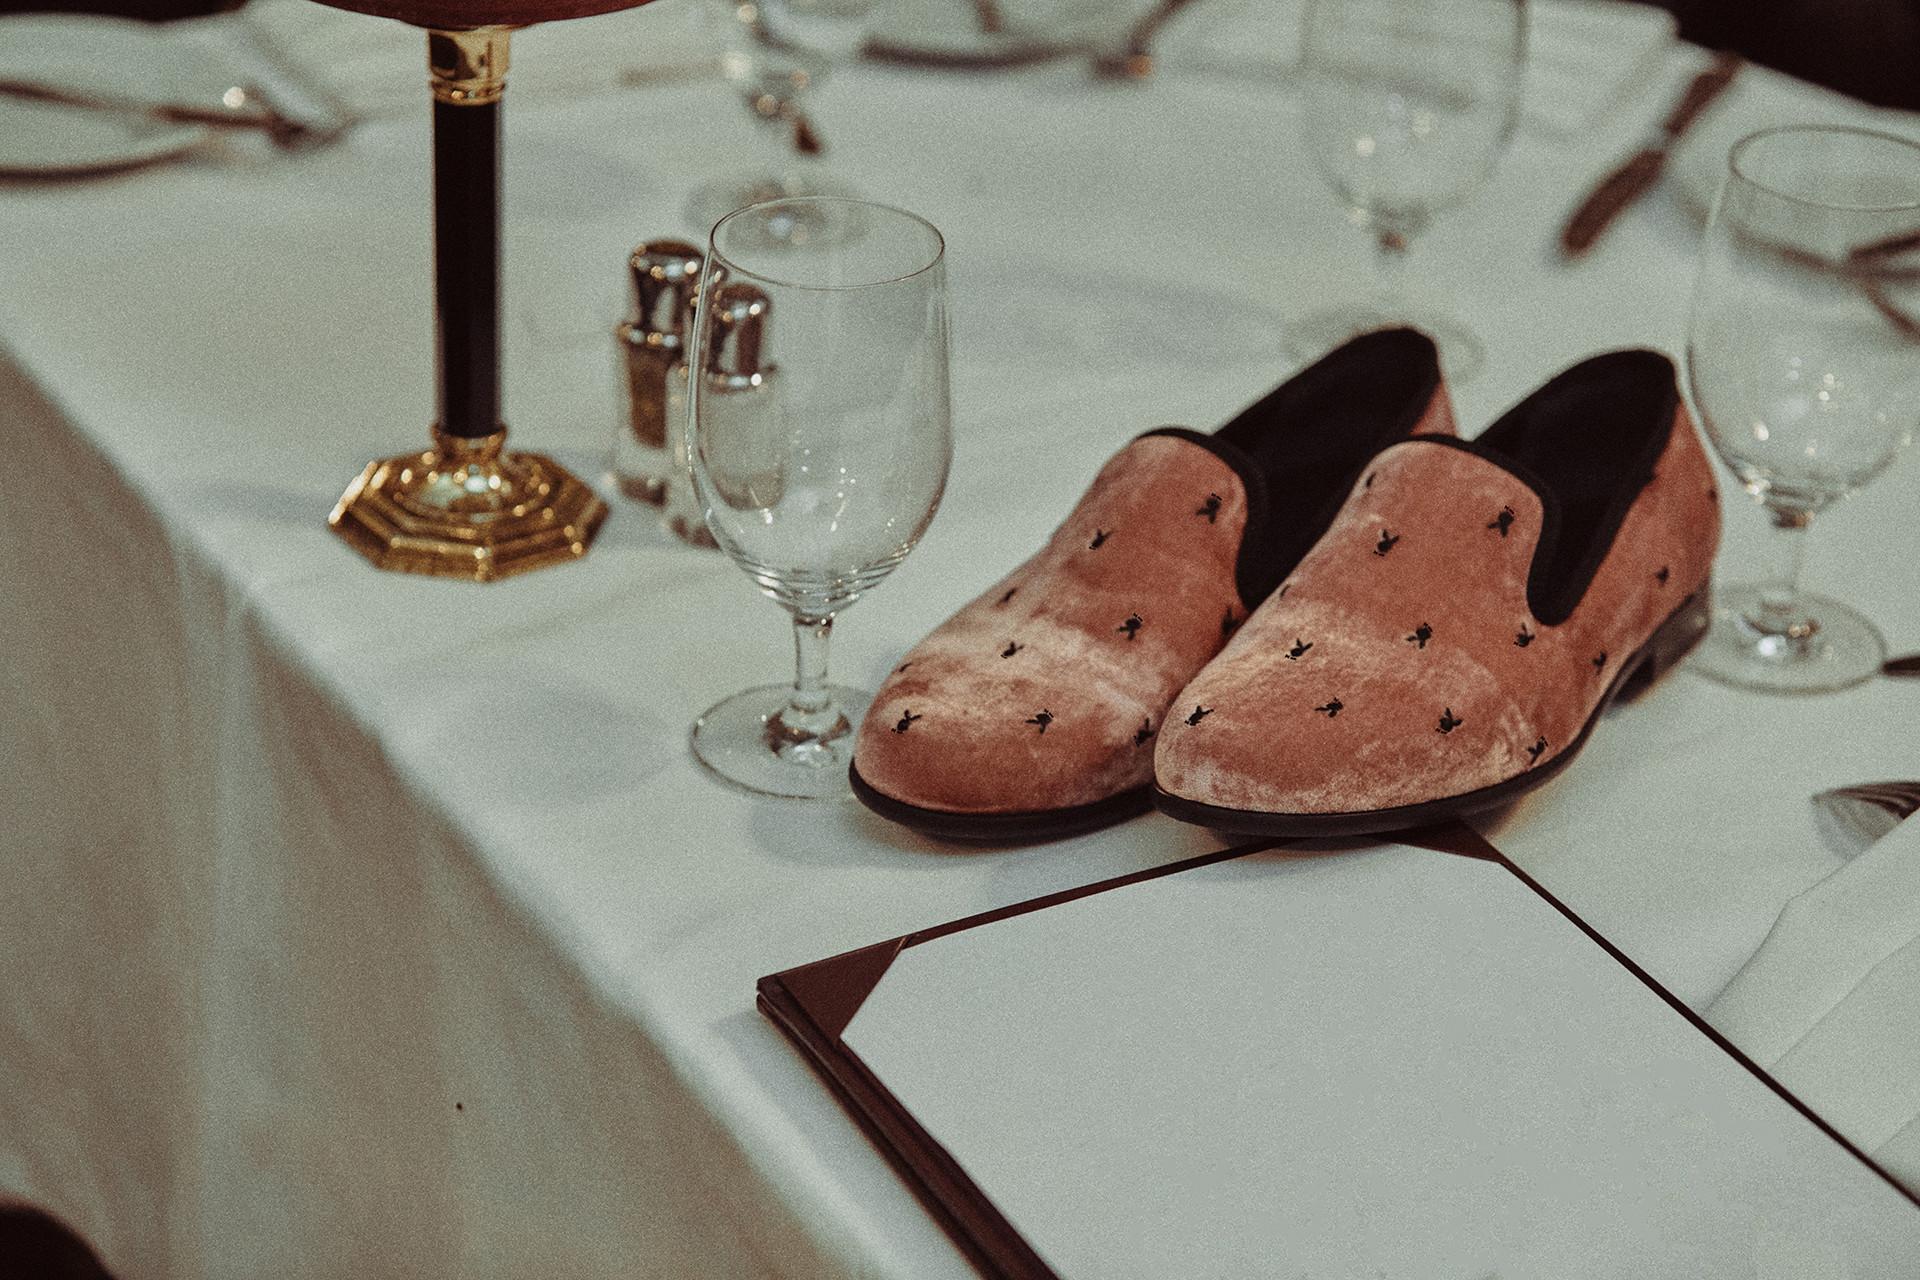 Luka Sabbat wearing Duke + Dexter x Playboy loafers